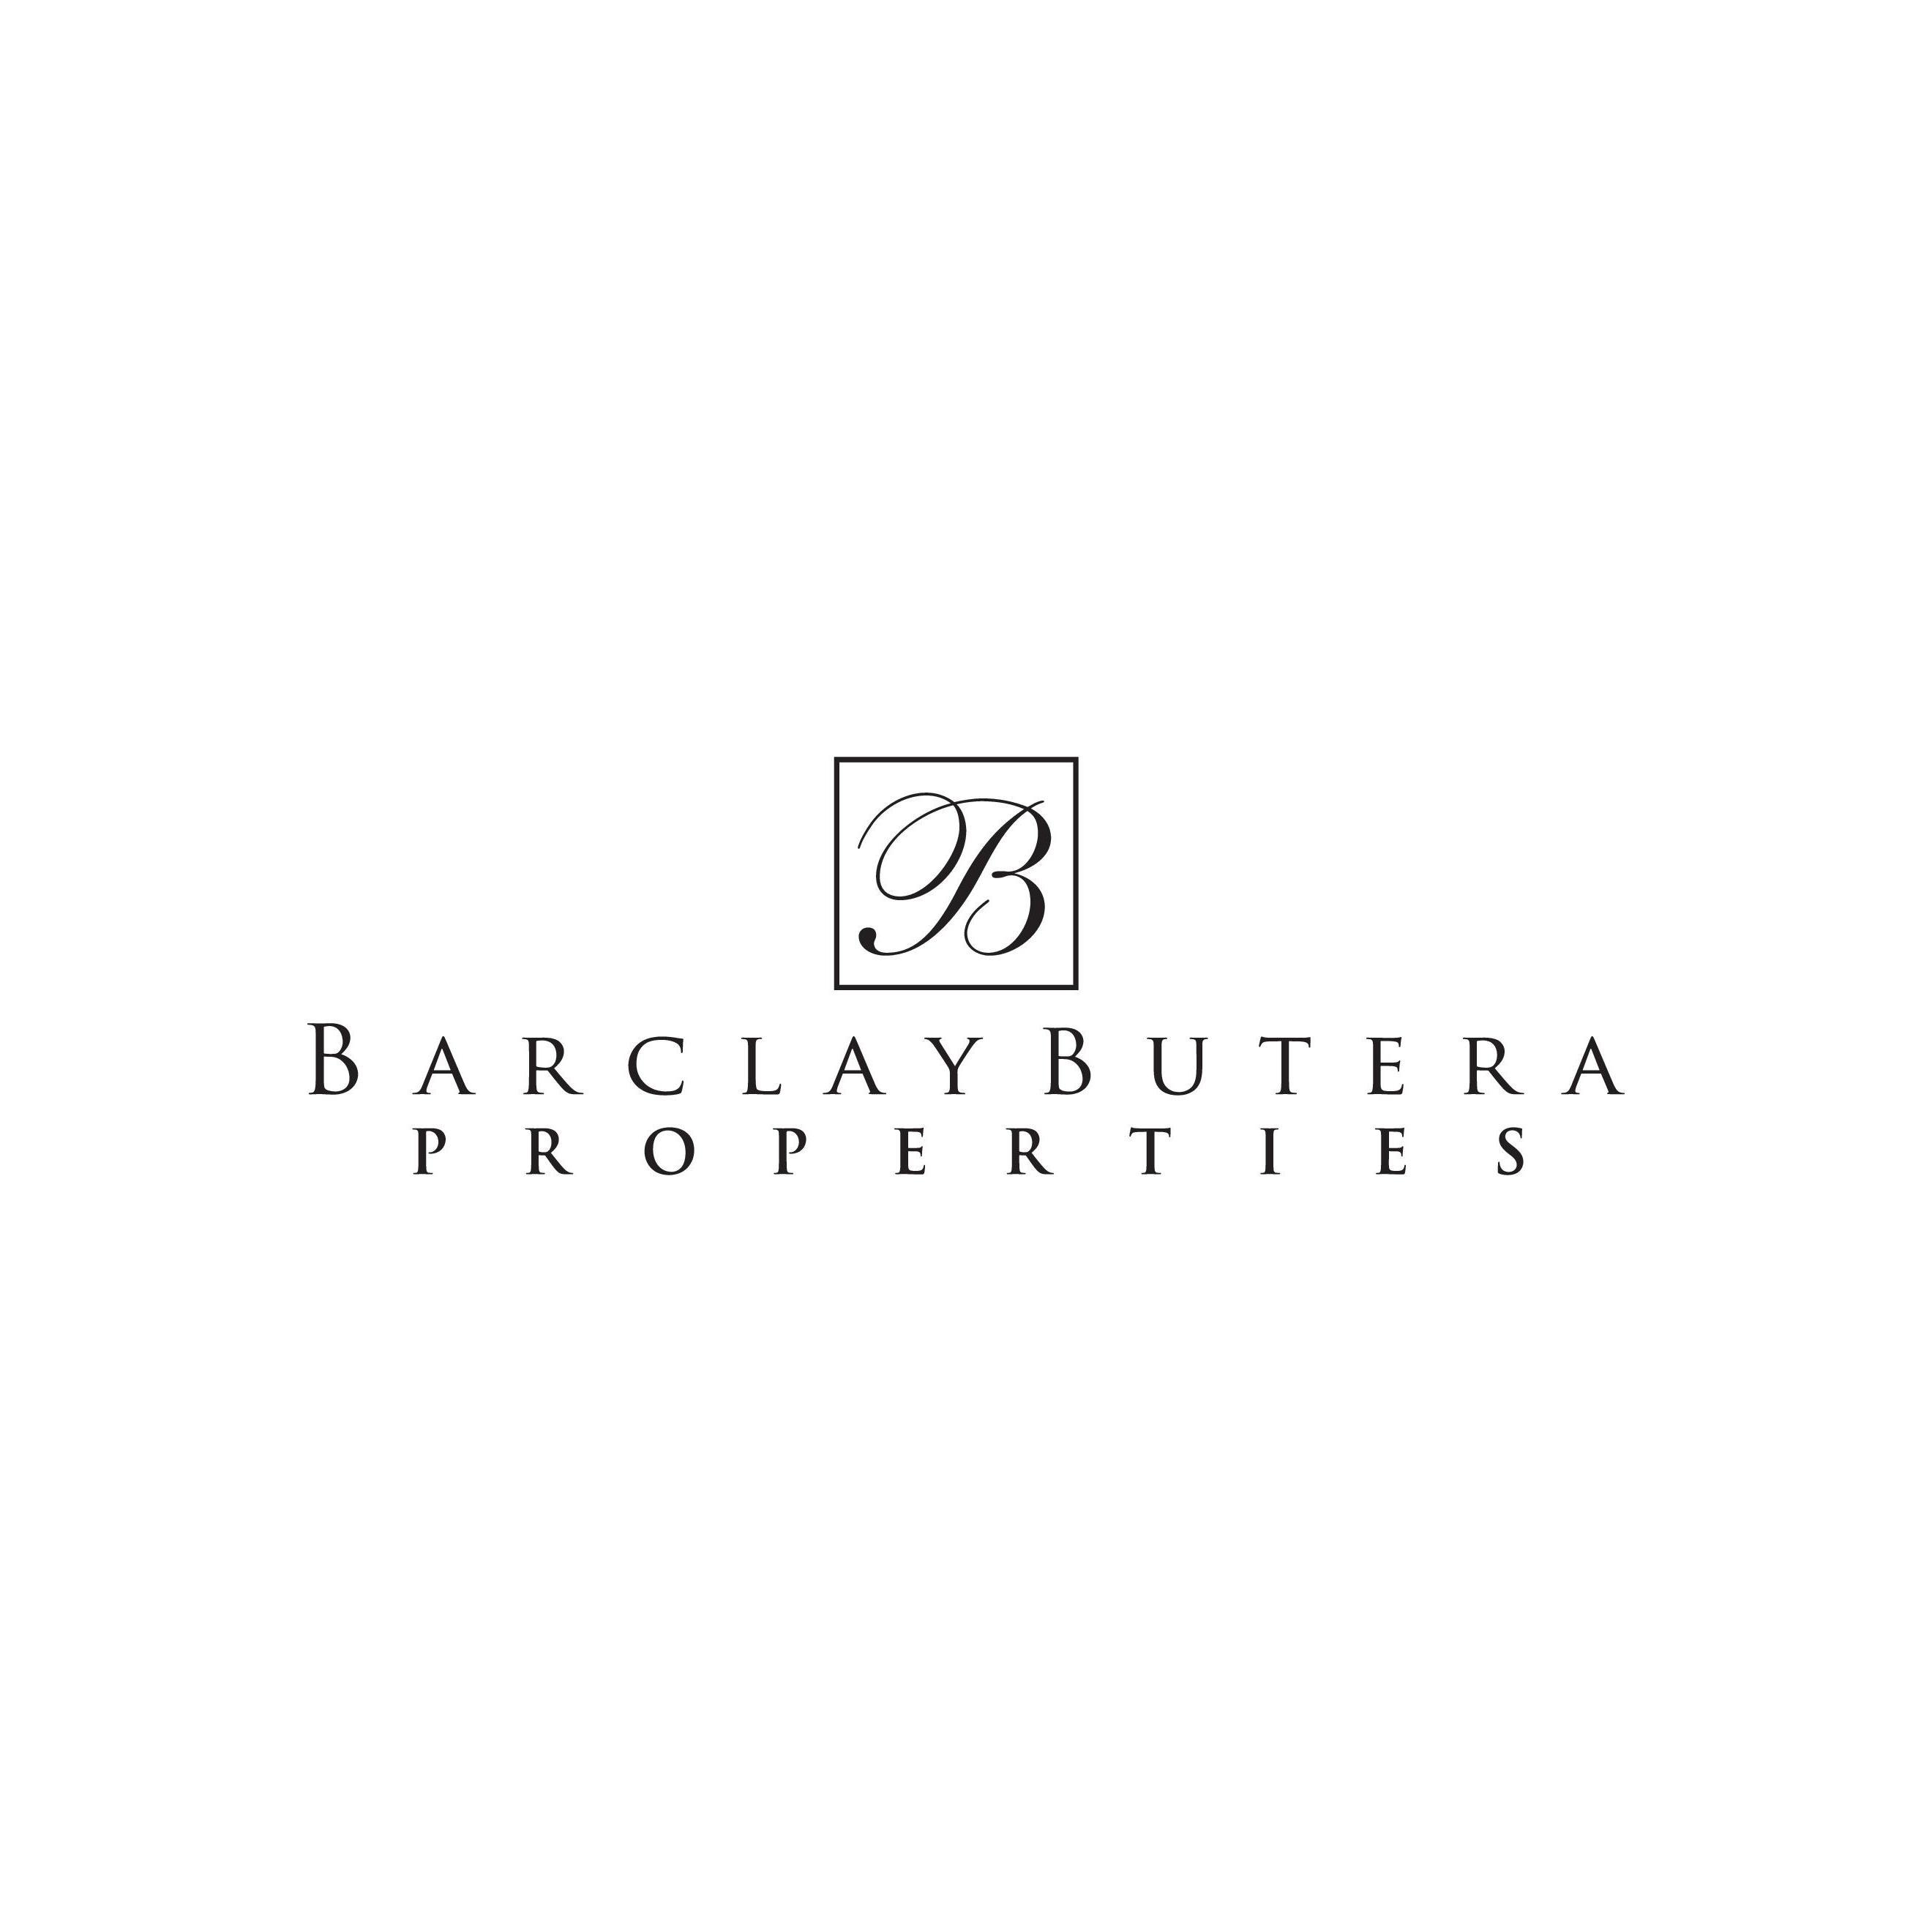 Barclay Butera Properties